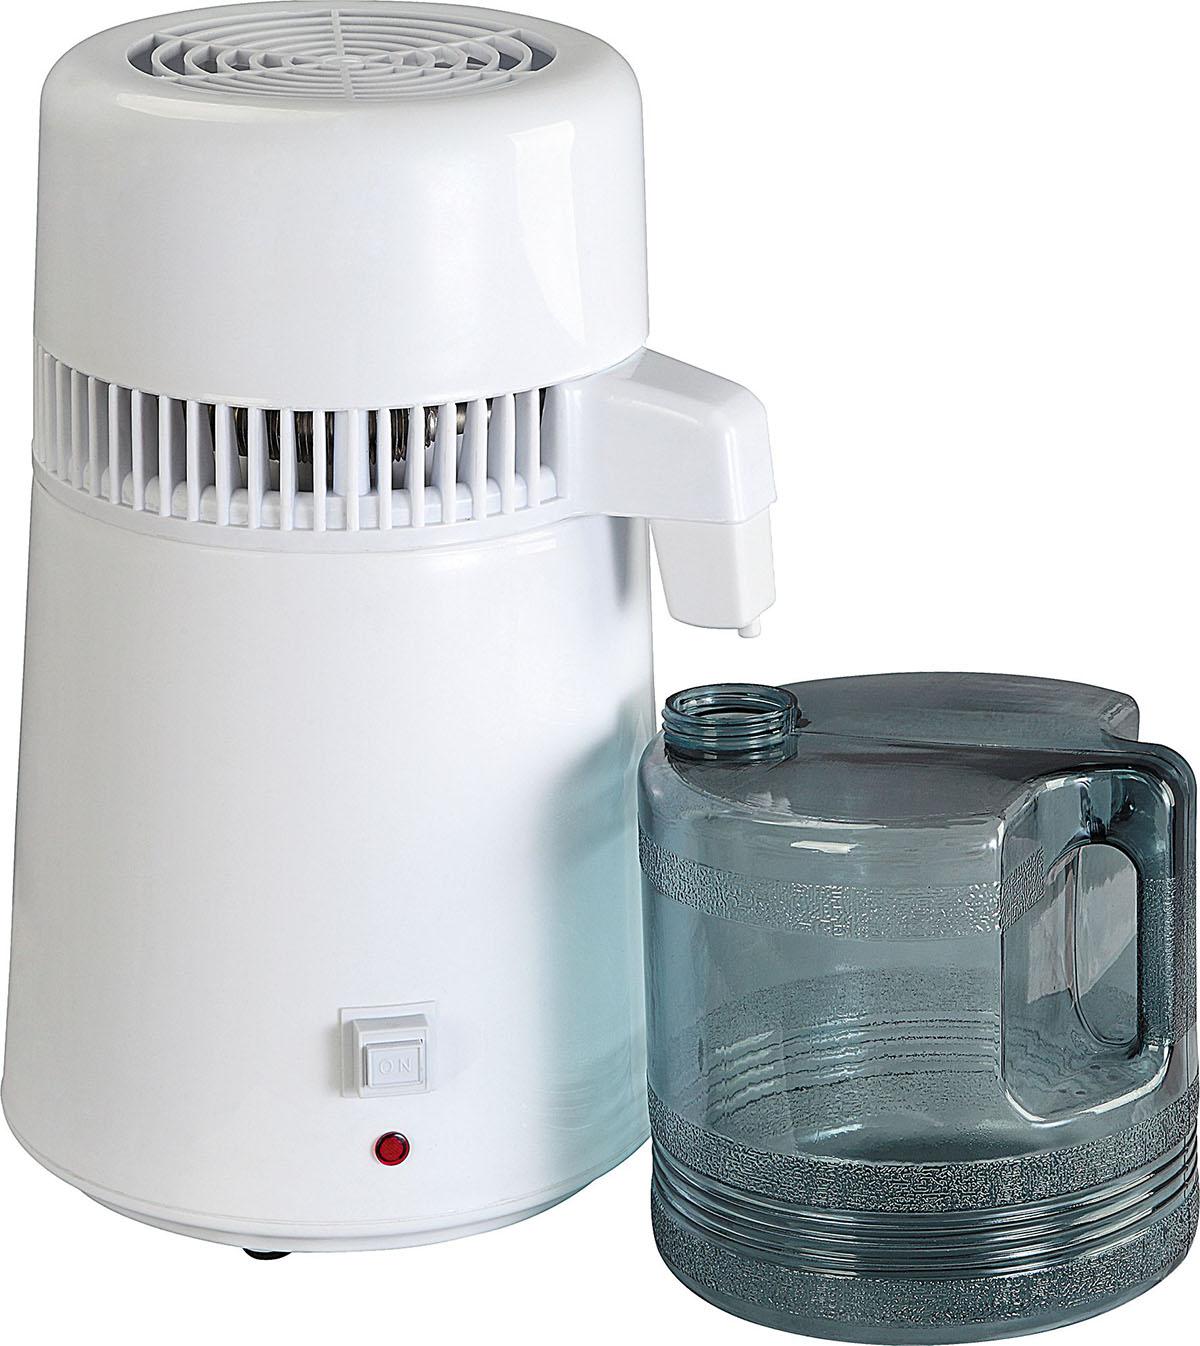 蒸馏水机SH-WD01